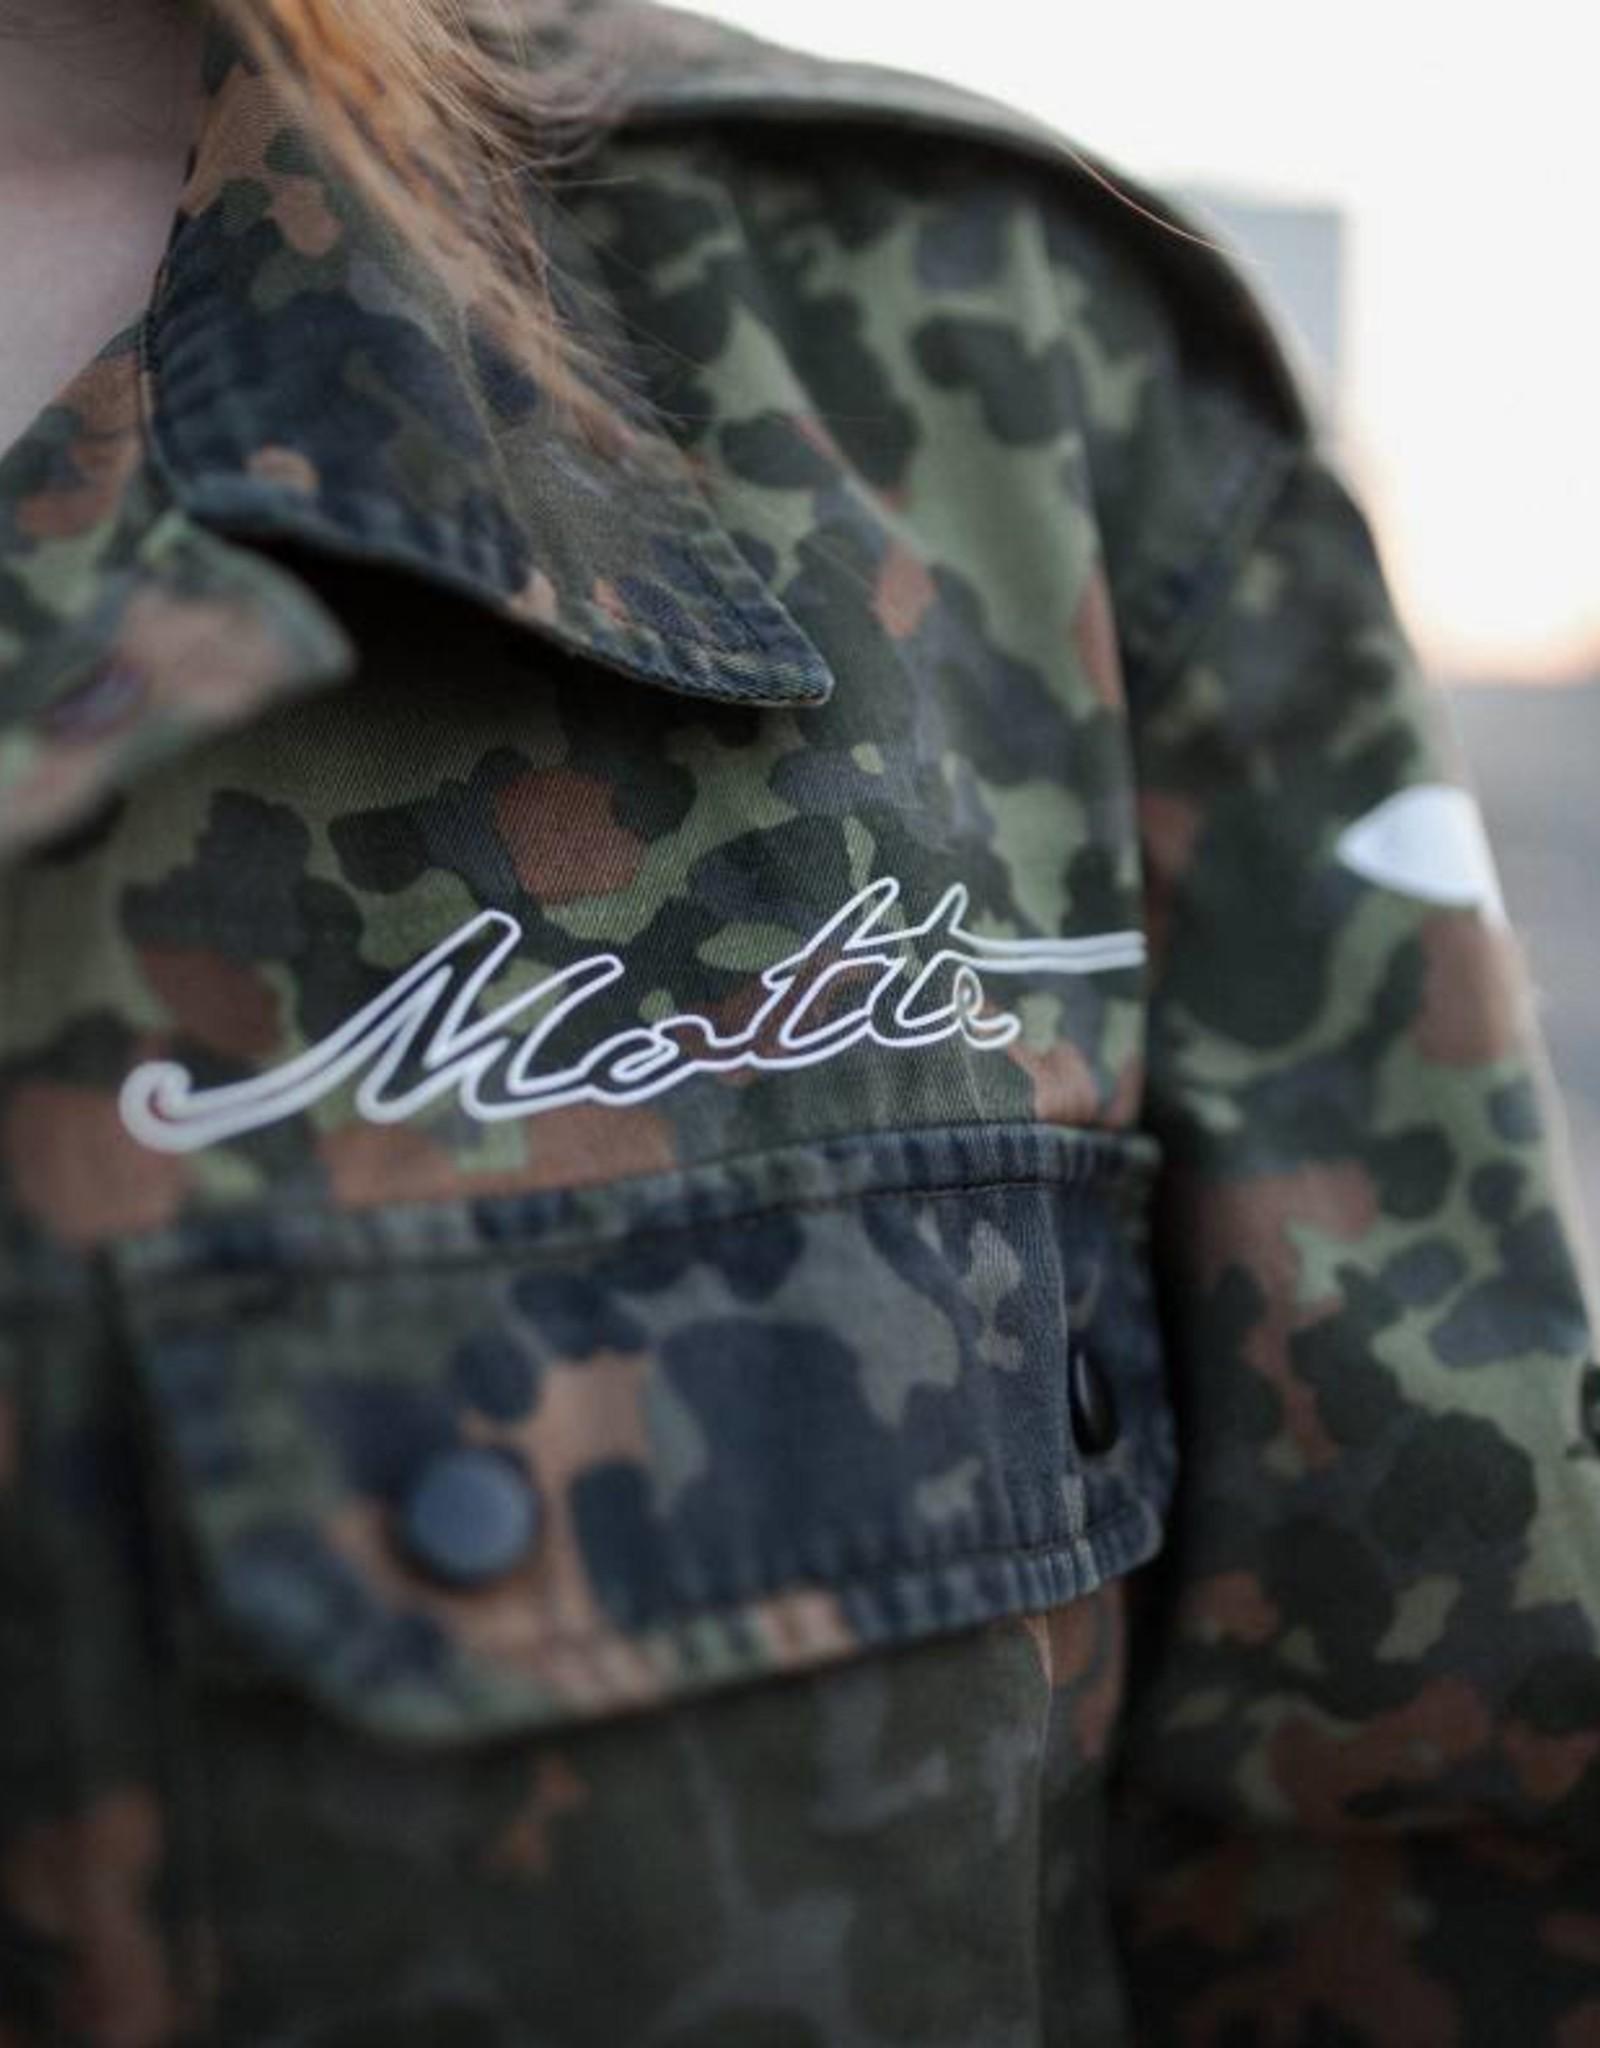 Camo jacket - individual